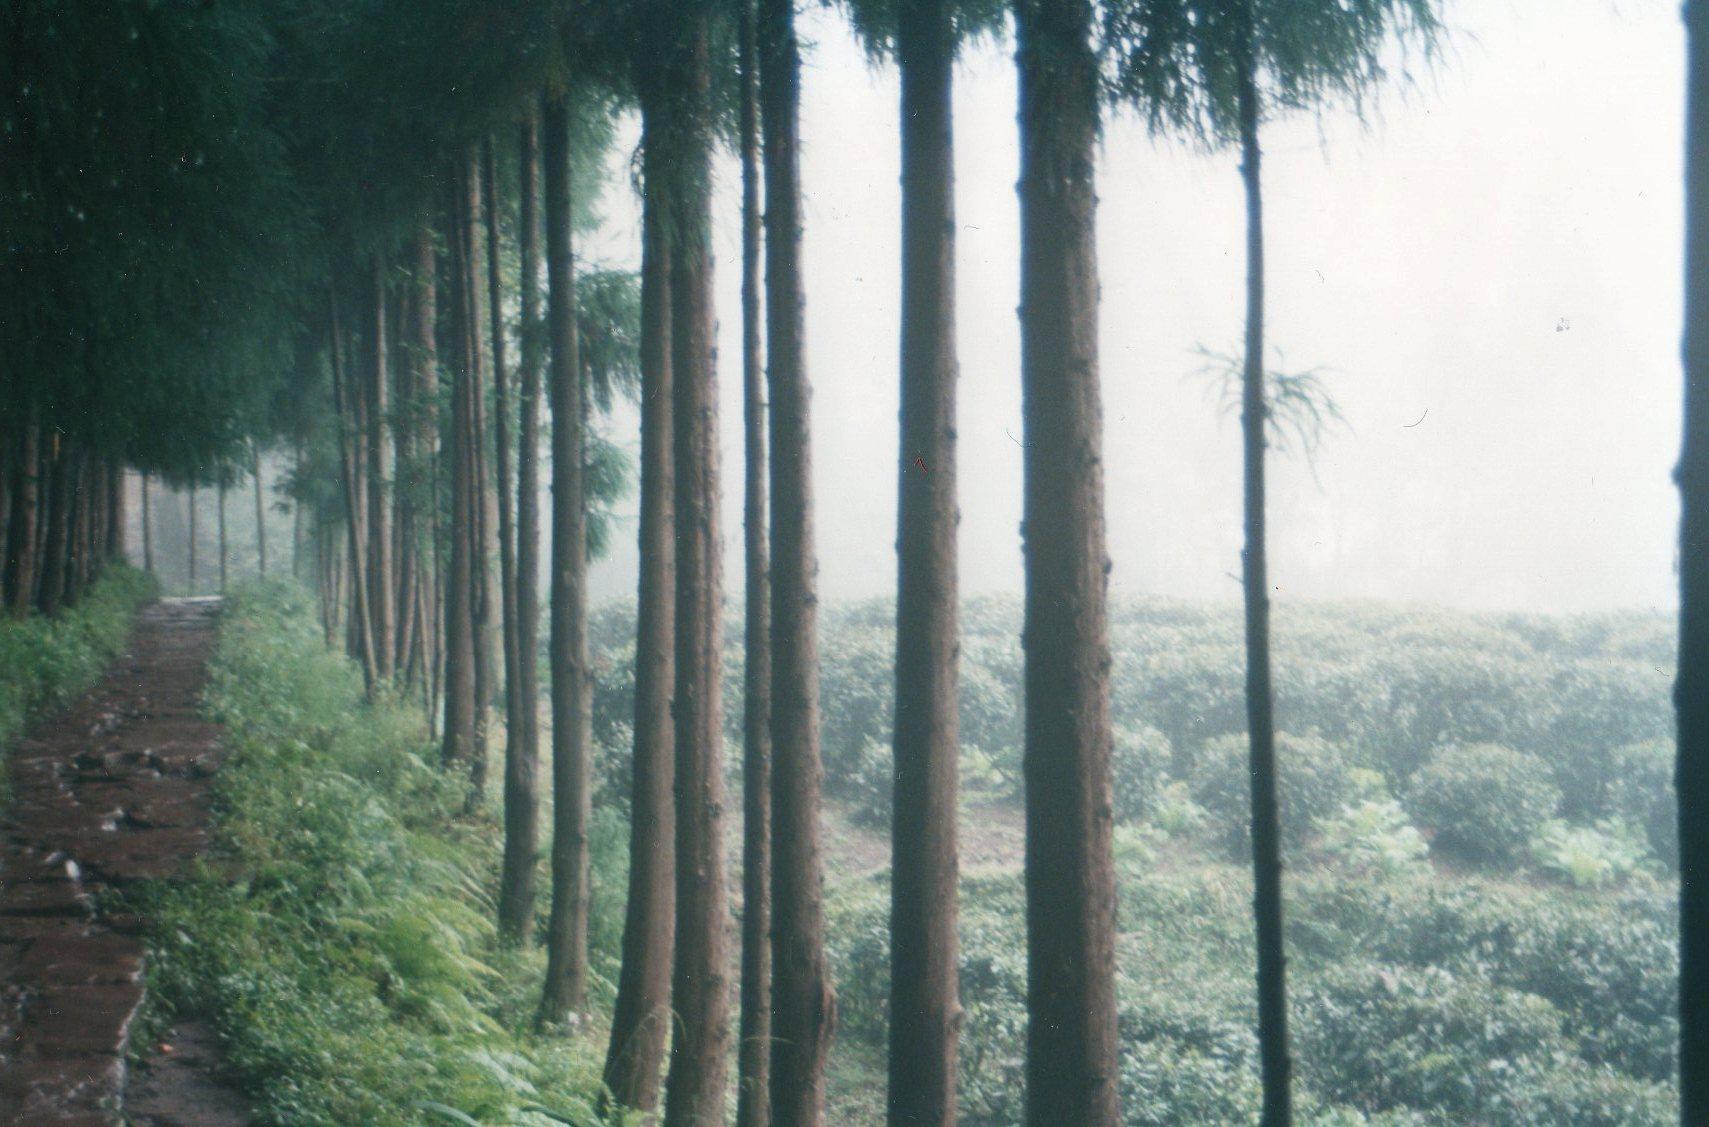 China Sichuan, Emei Shan, Tea plantations on the lower slopes, Walkopedia